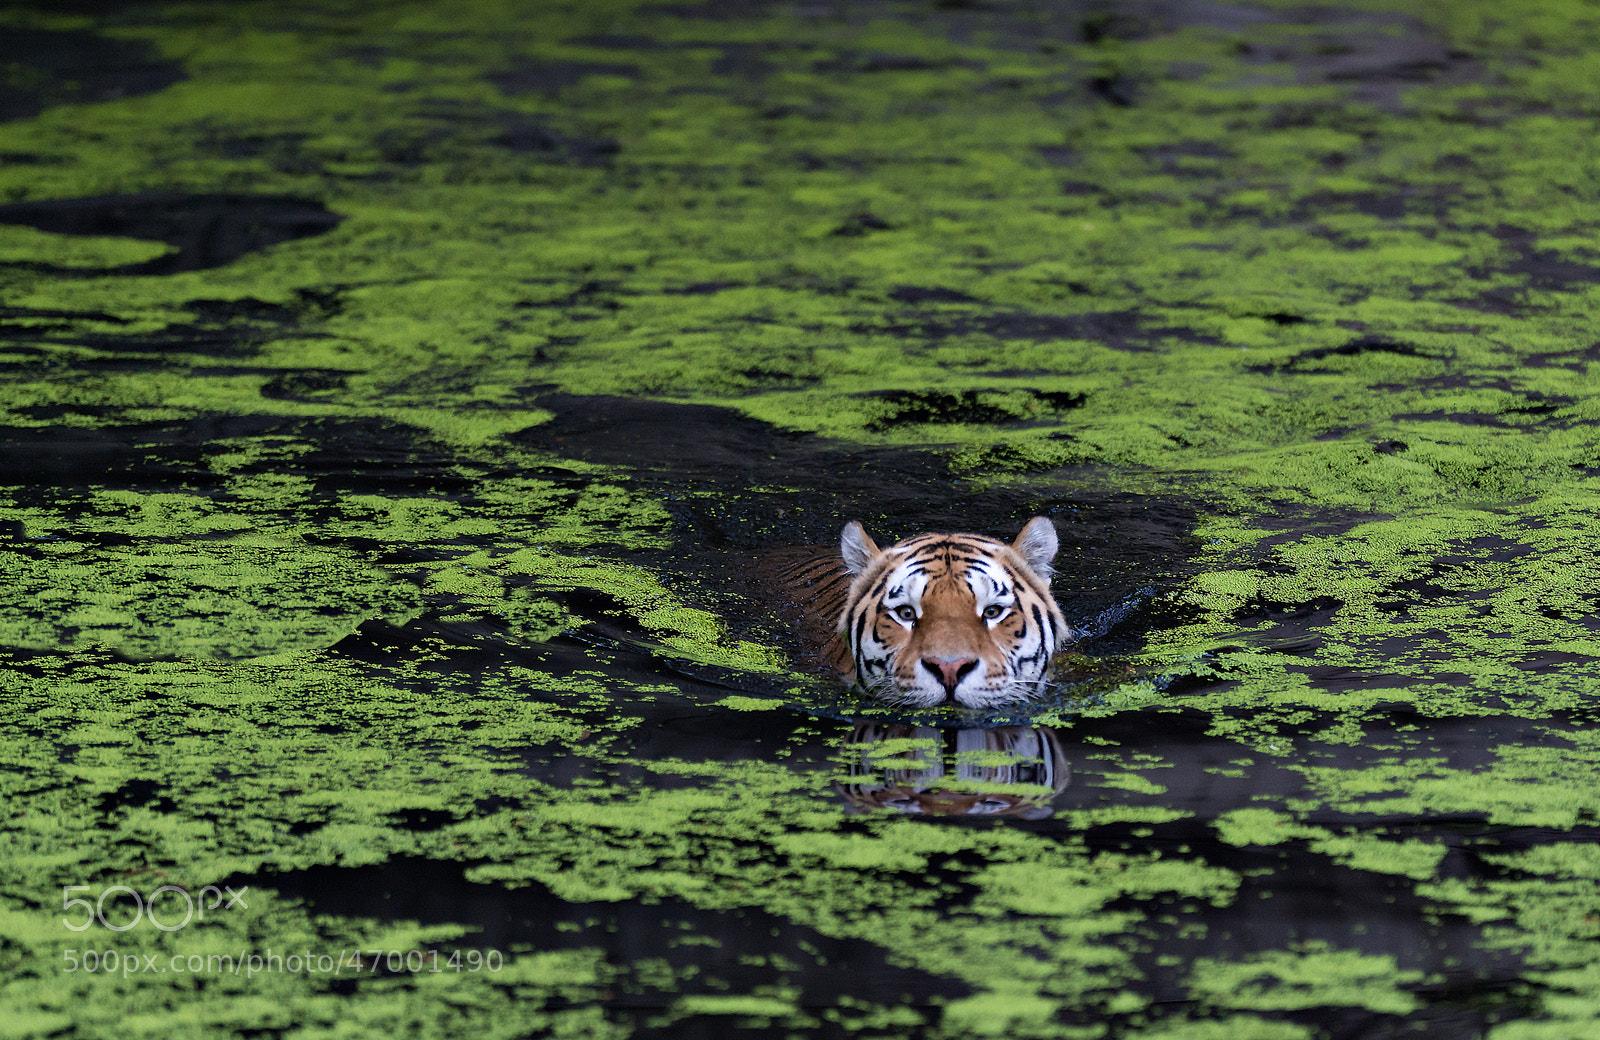 Photograph Swiming tiger by Henrik Vind on 500px